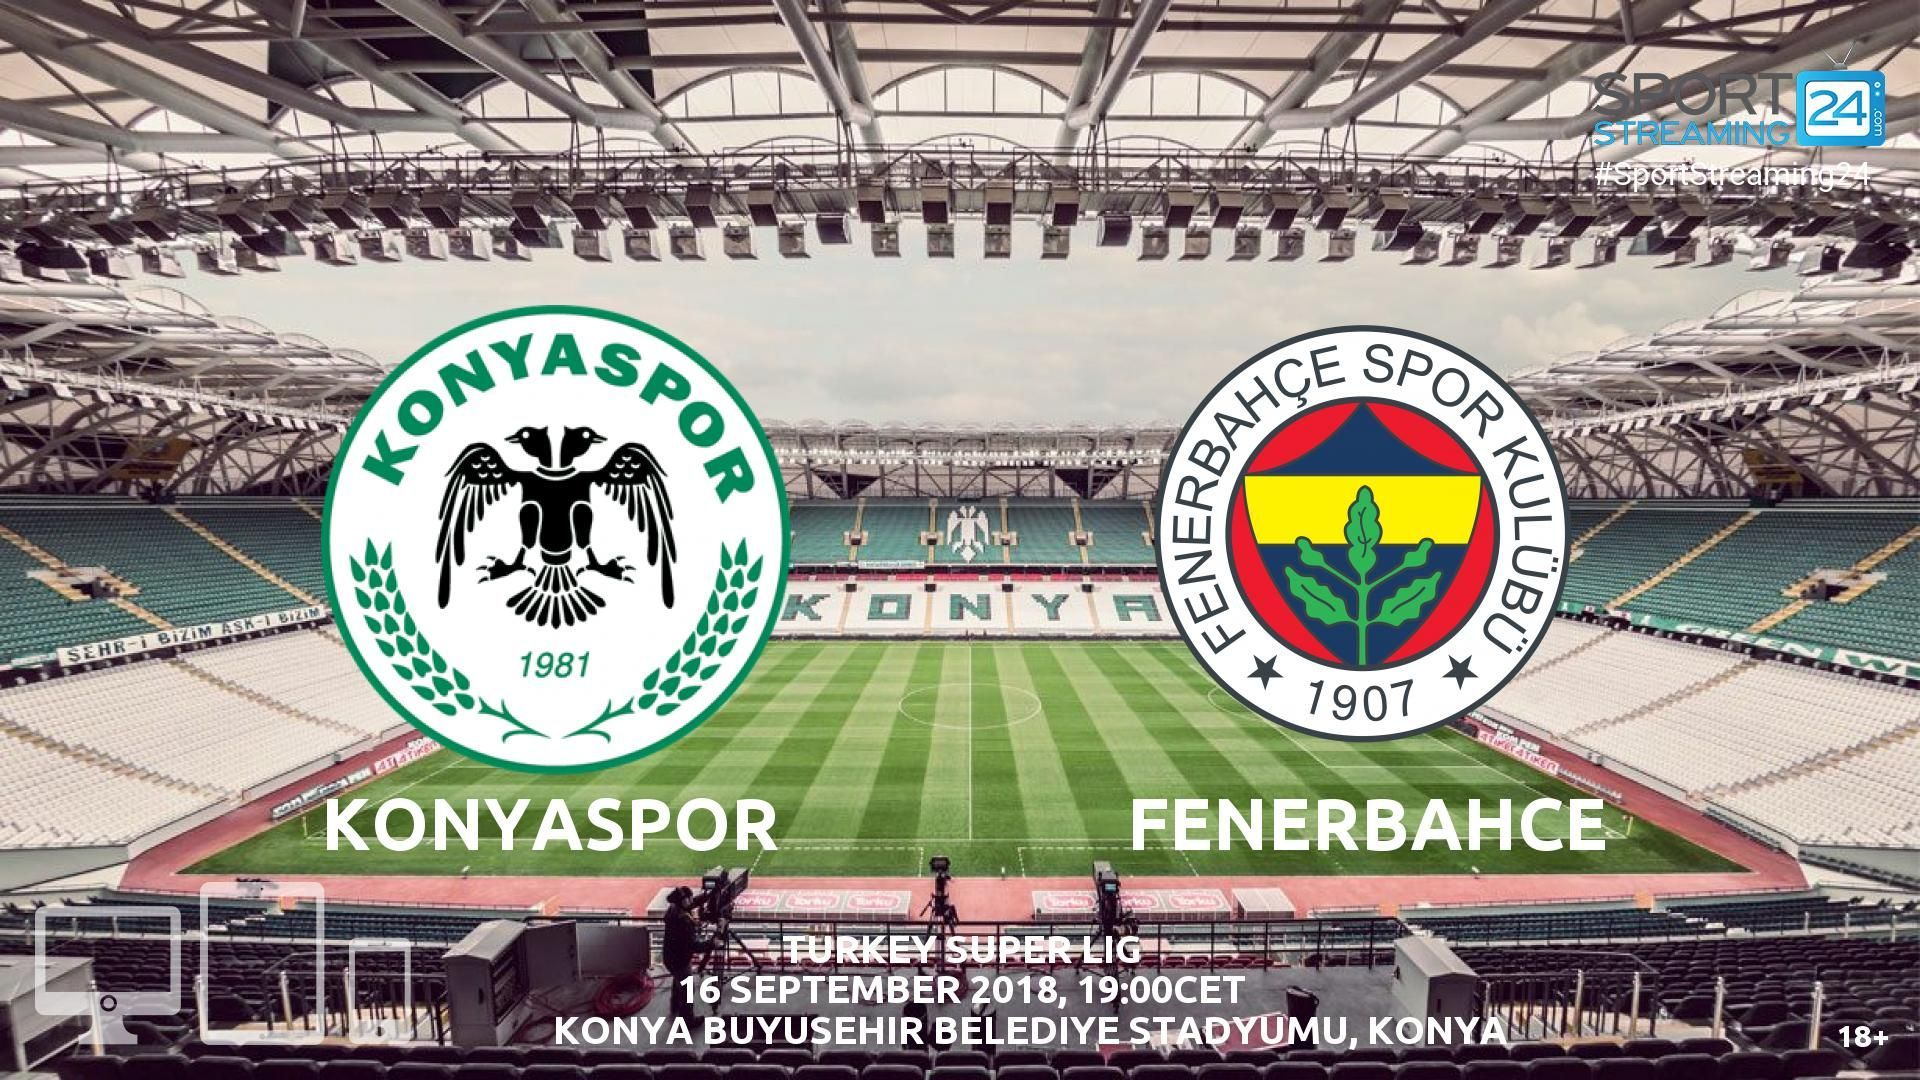 Konyaspor Fenerbahce Live Stream